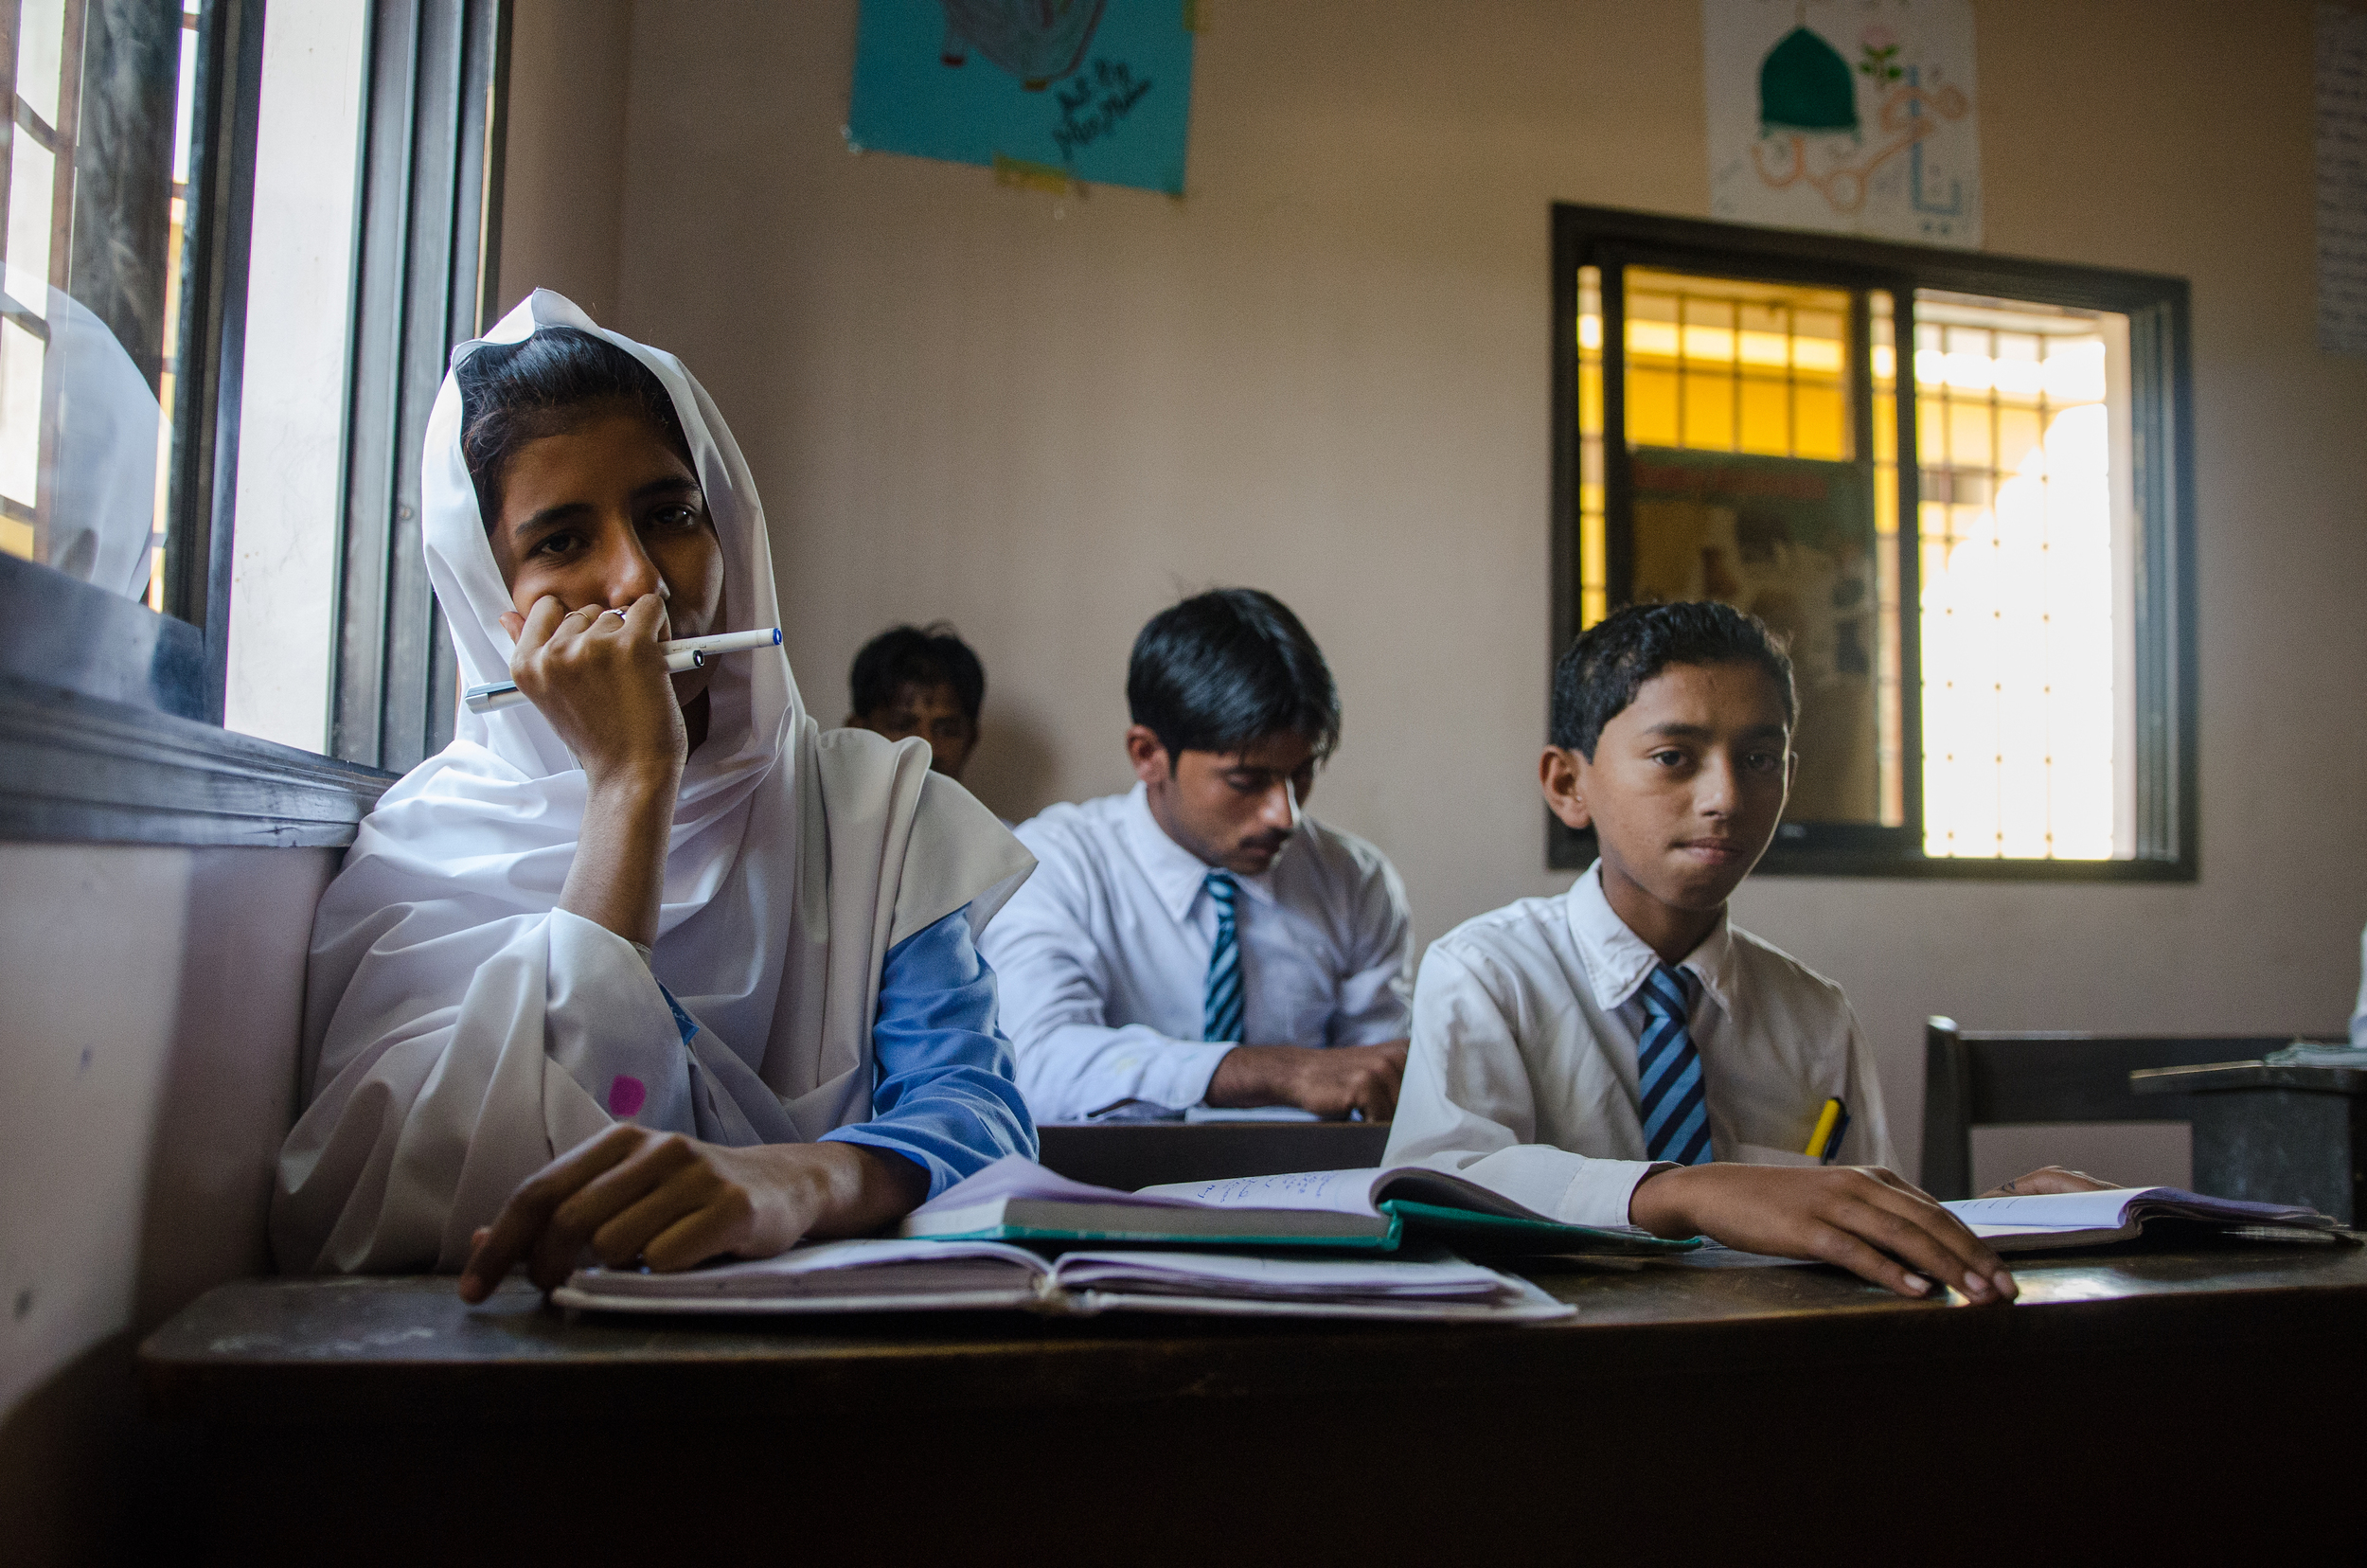 HOPE in Thatta | Thatta, Sindh Province